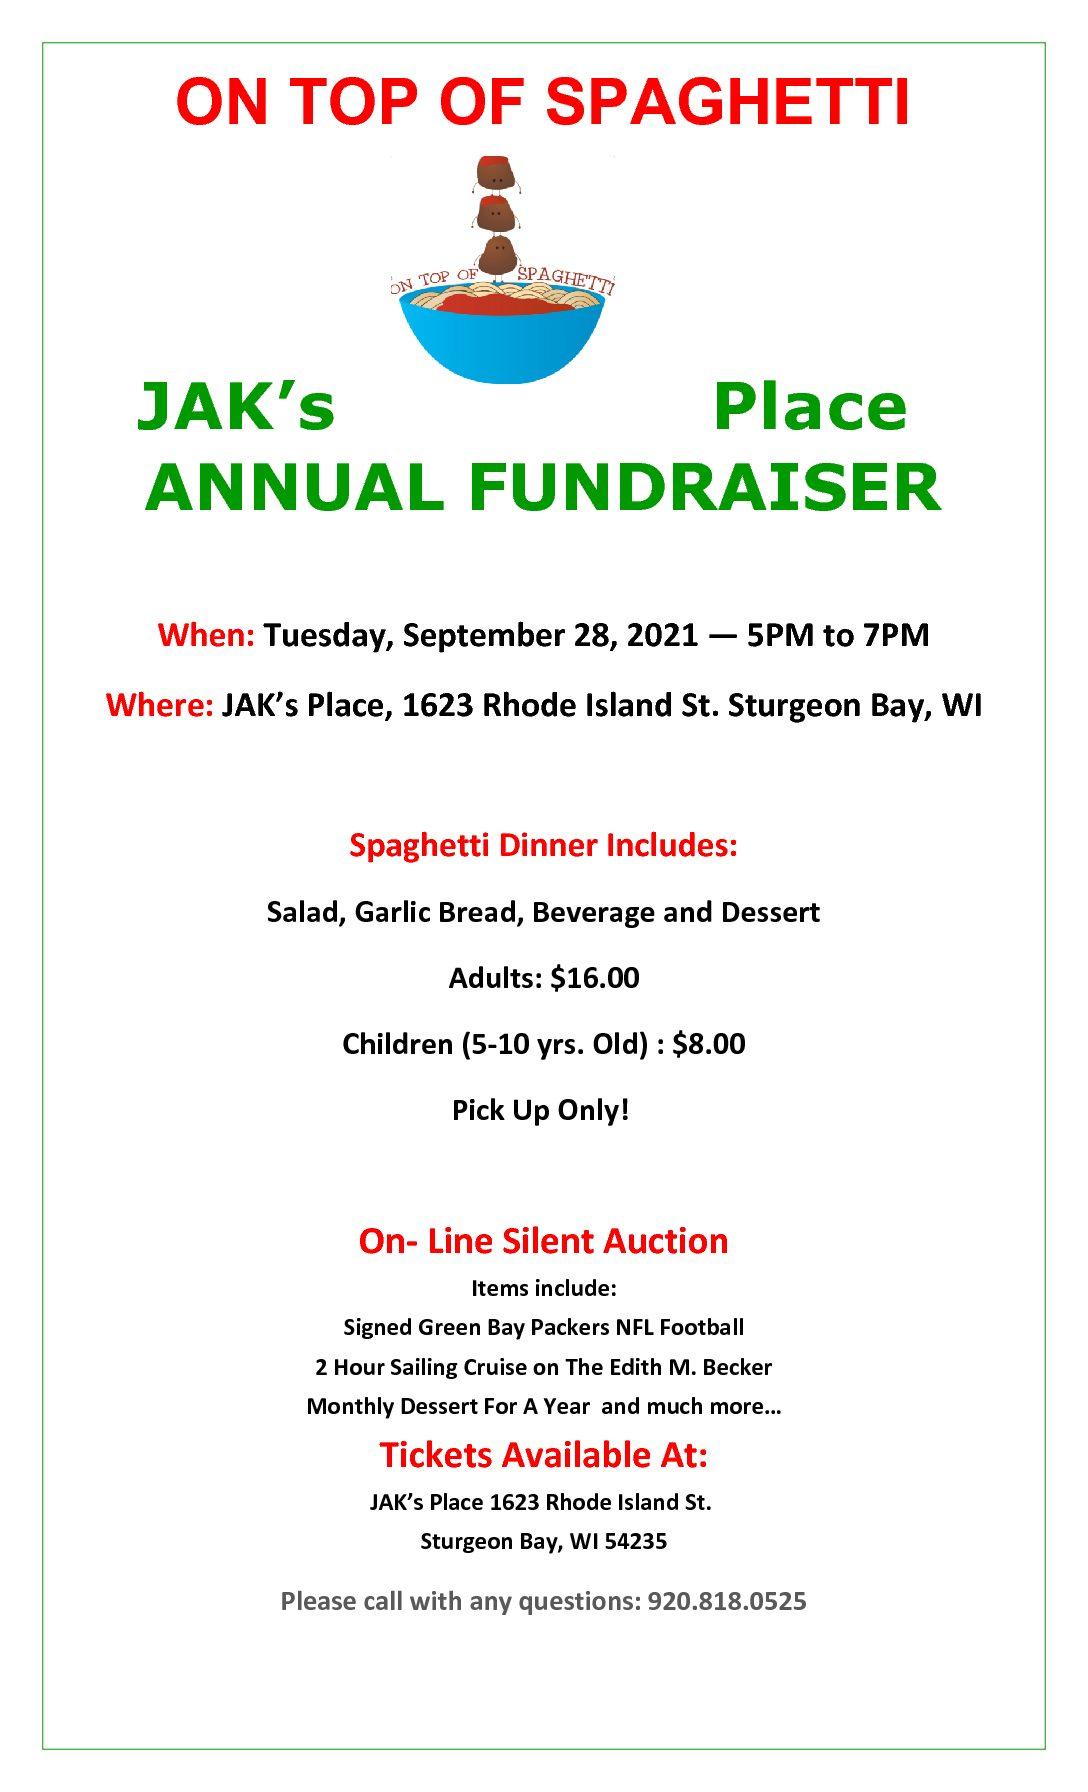 Jak's Place Annual Spaghetti Dinner Fundraiser